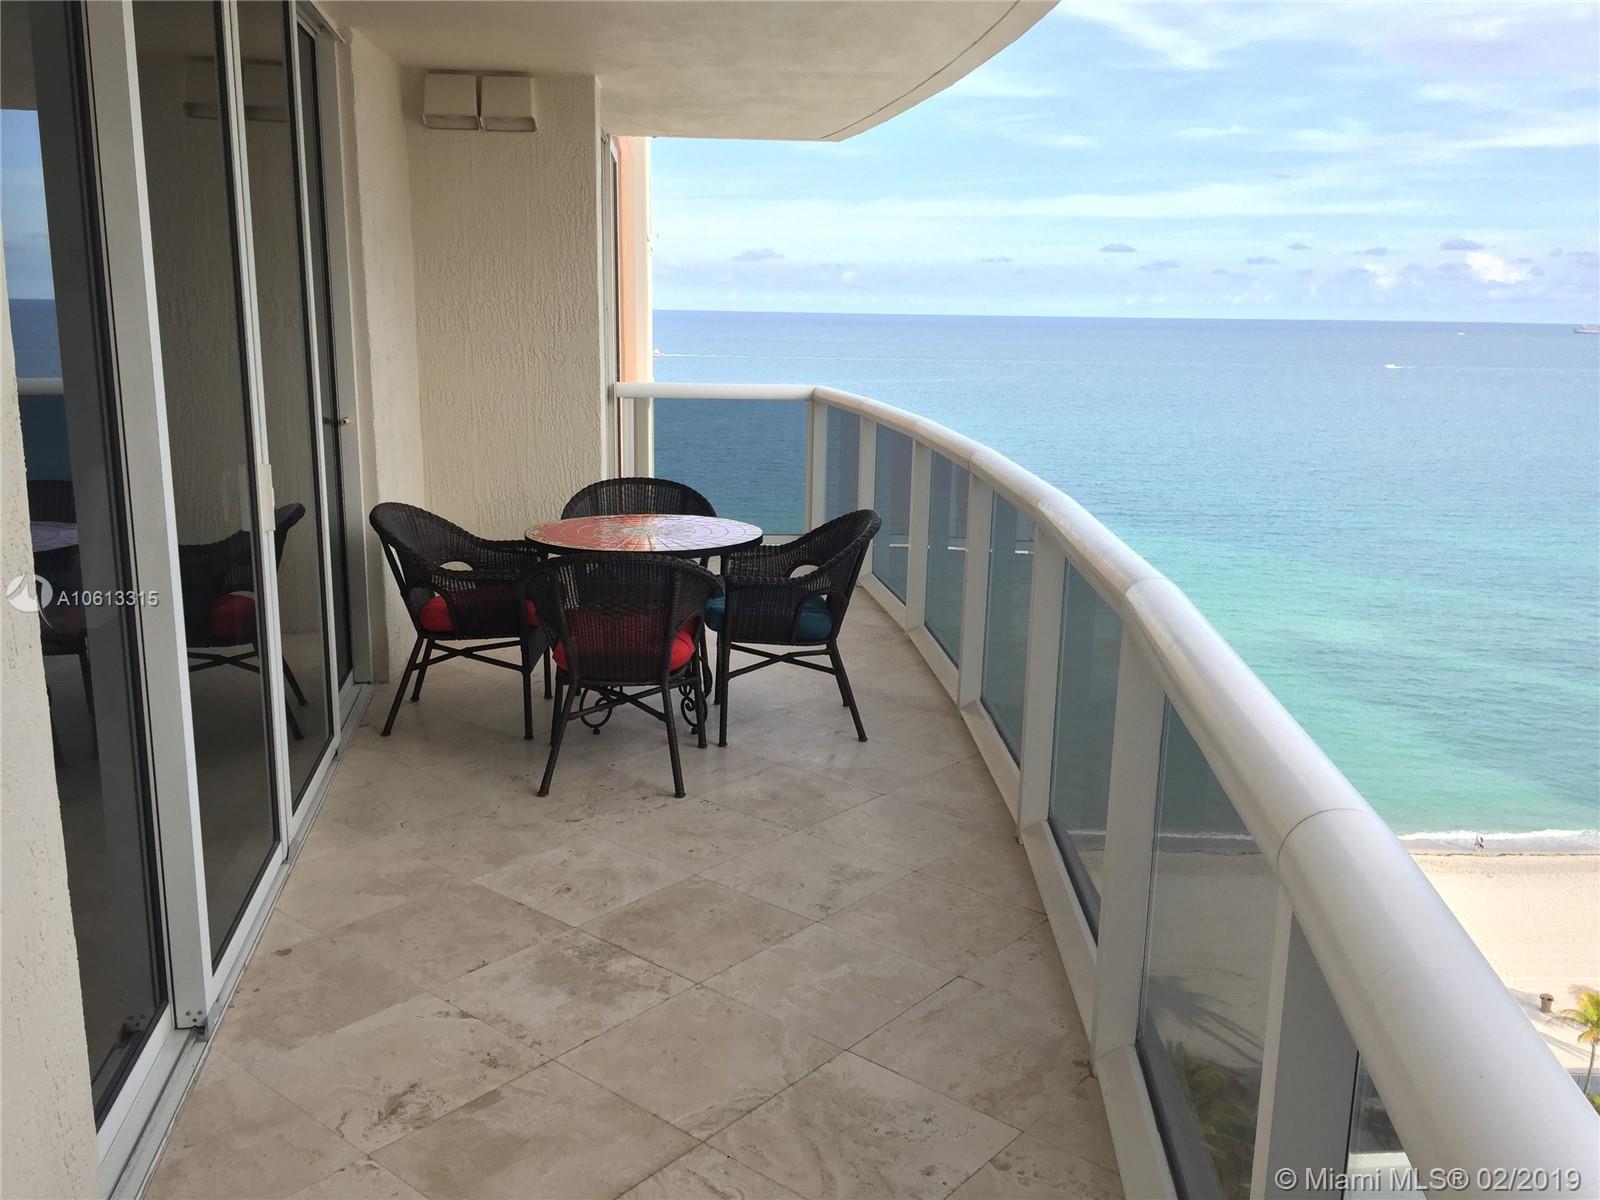 Ocean III Condo / Sunny Isles Beach / 2 Beds / 2 Baths / 1,597 sq. ft. of living area / Very nice sp